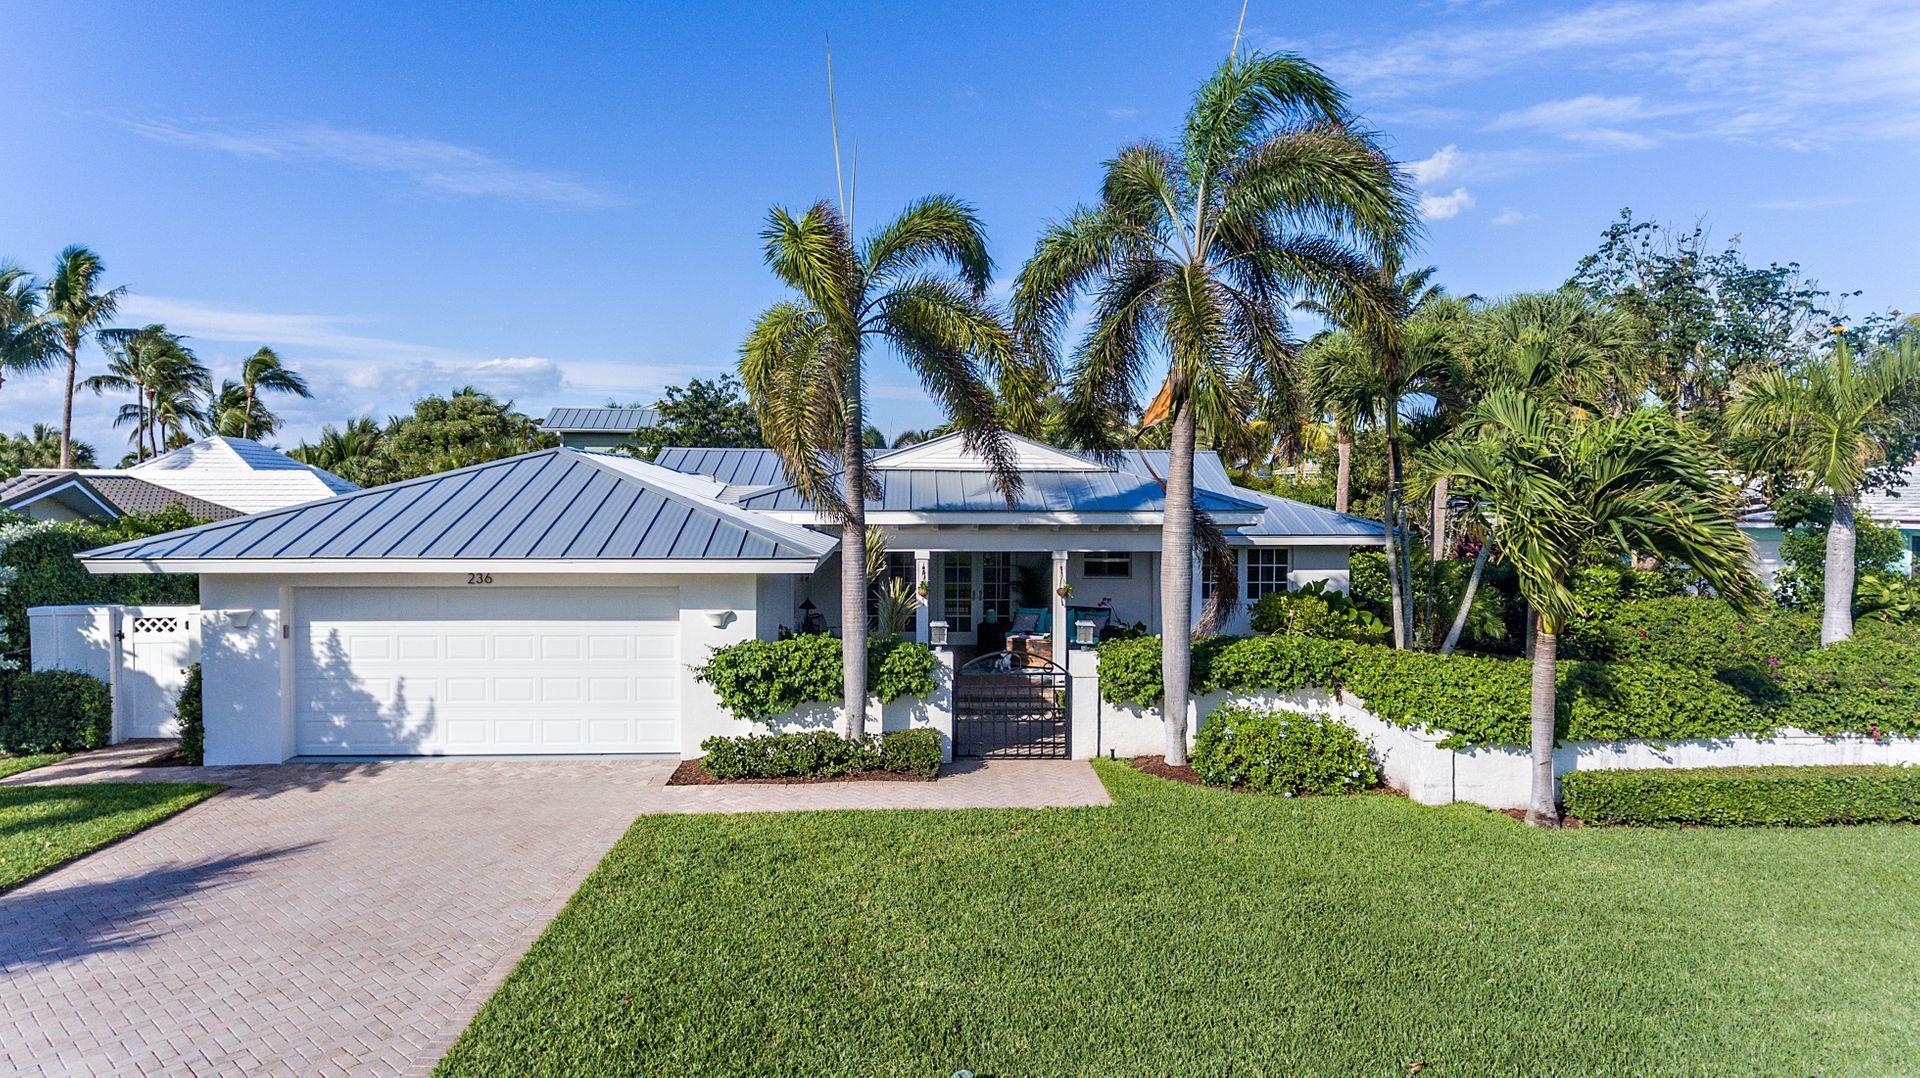 236 Beacon Lane, Jupiter Inlet Colony, Florida 33469, 3 Bedrooms Bedrooms, ,2.1 BathroomsBathrooms,A,Single family,Beacon,RX-10596957